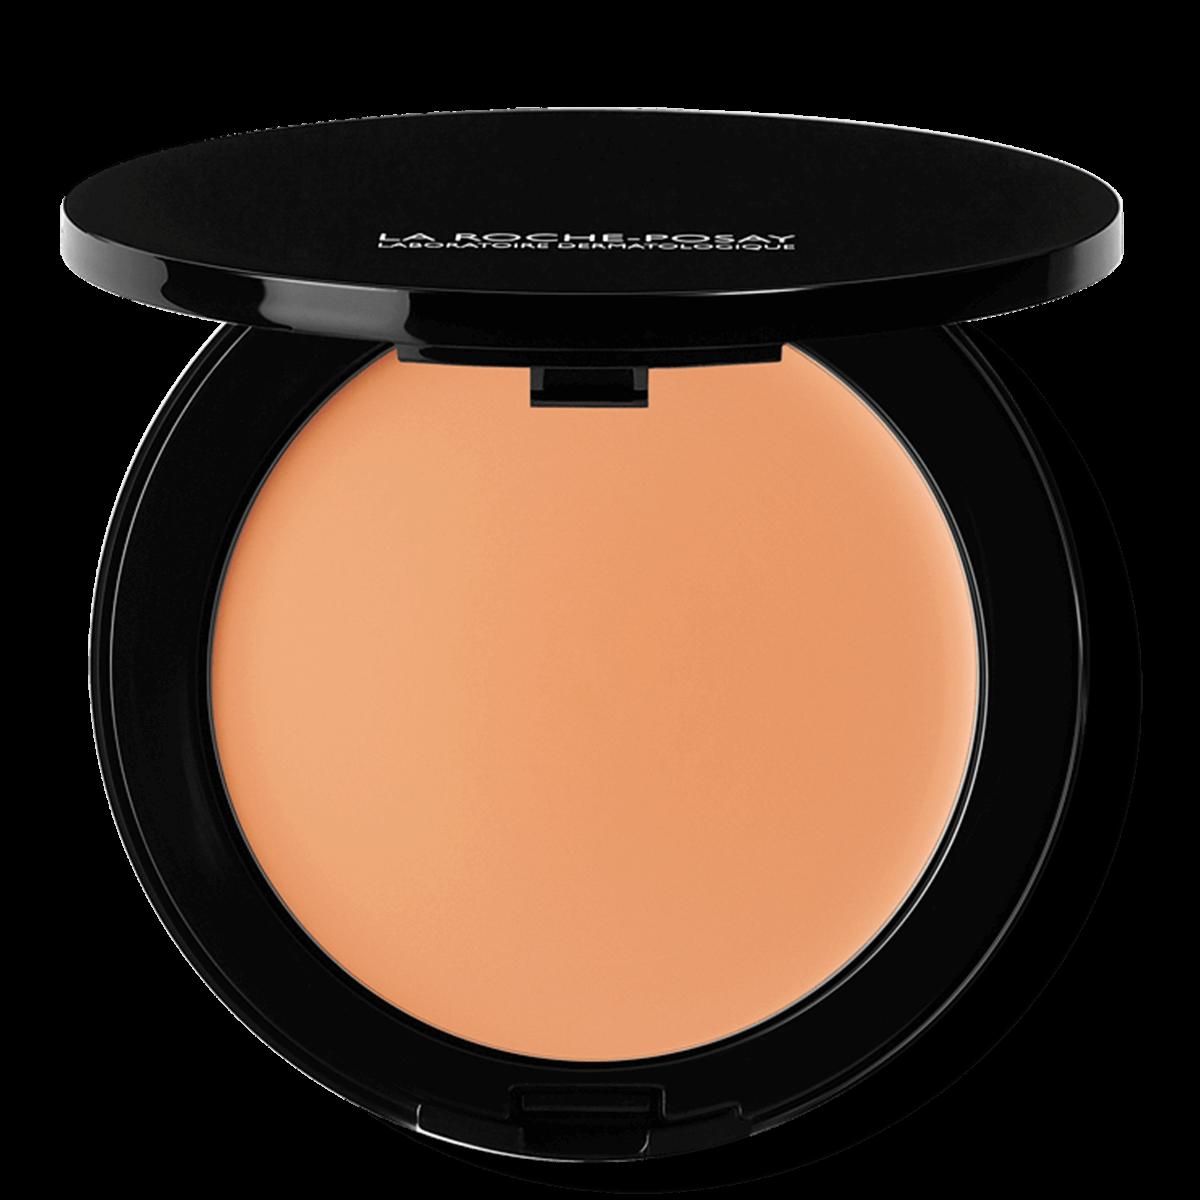 La Roche Posay Känslig Toleriane Make up COMPACT CREAM 13SandBeige 3